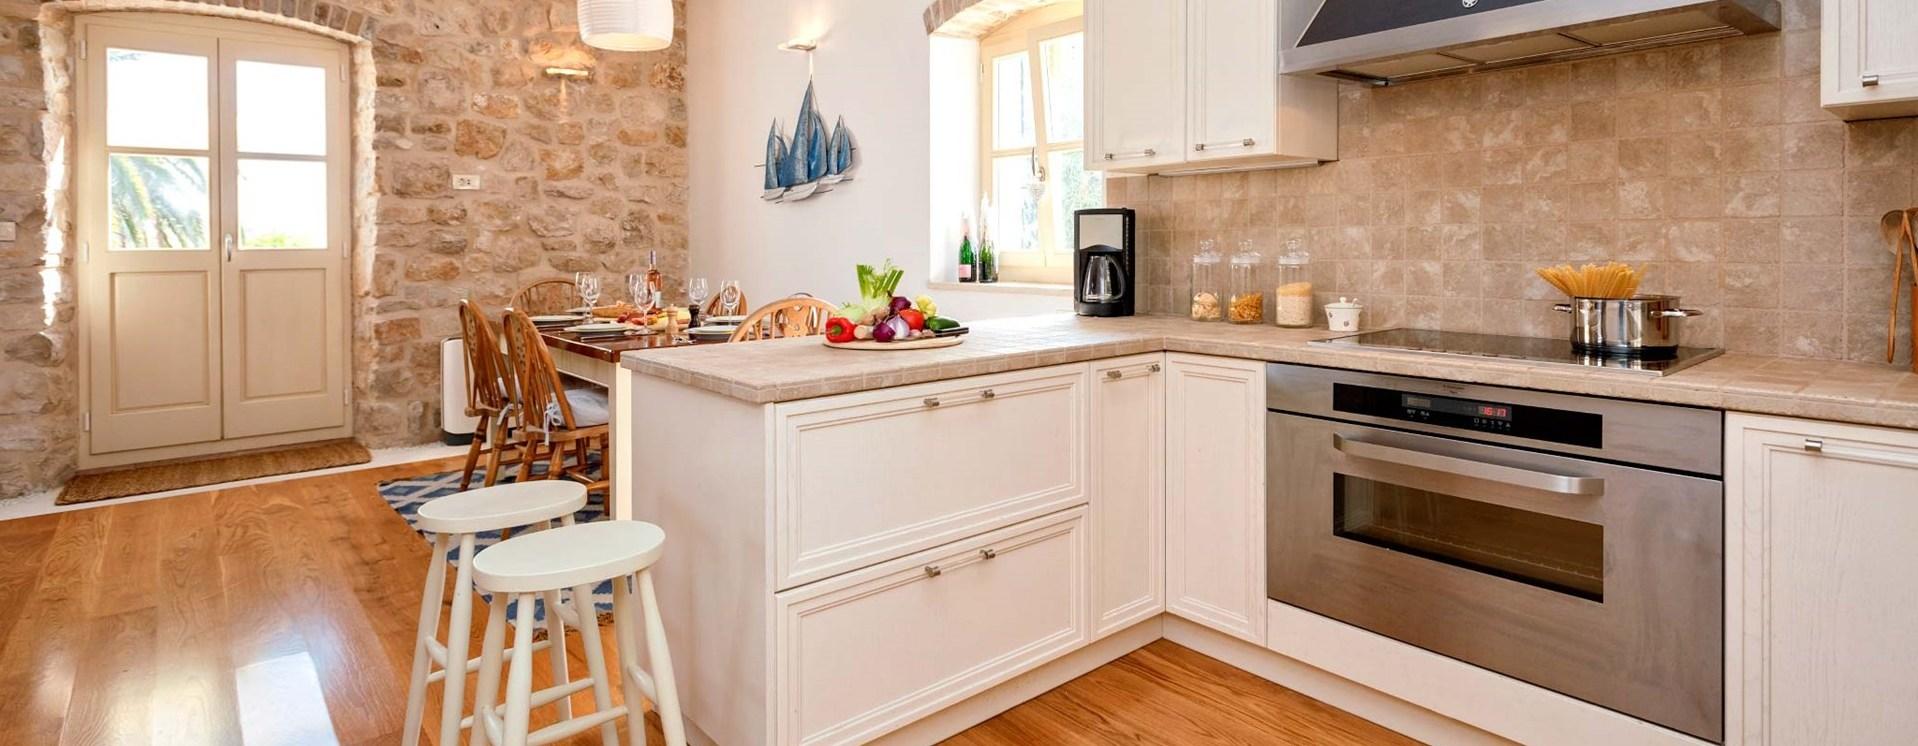 hvar-house-kitchen